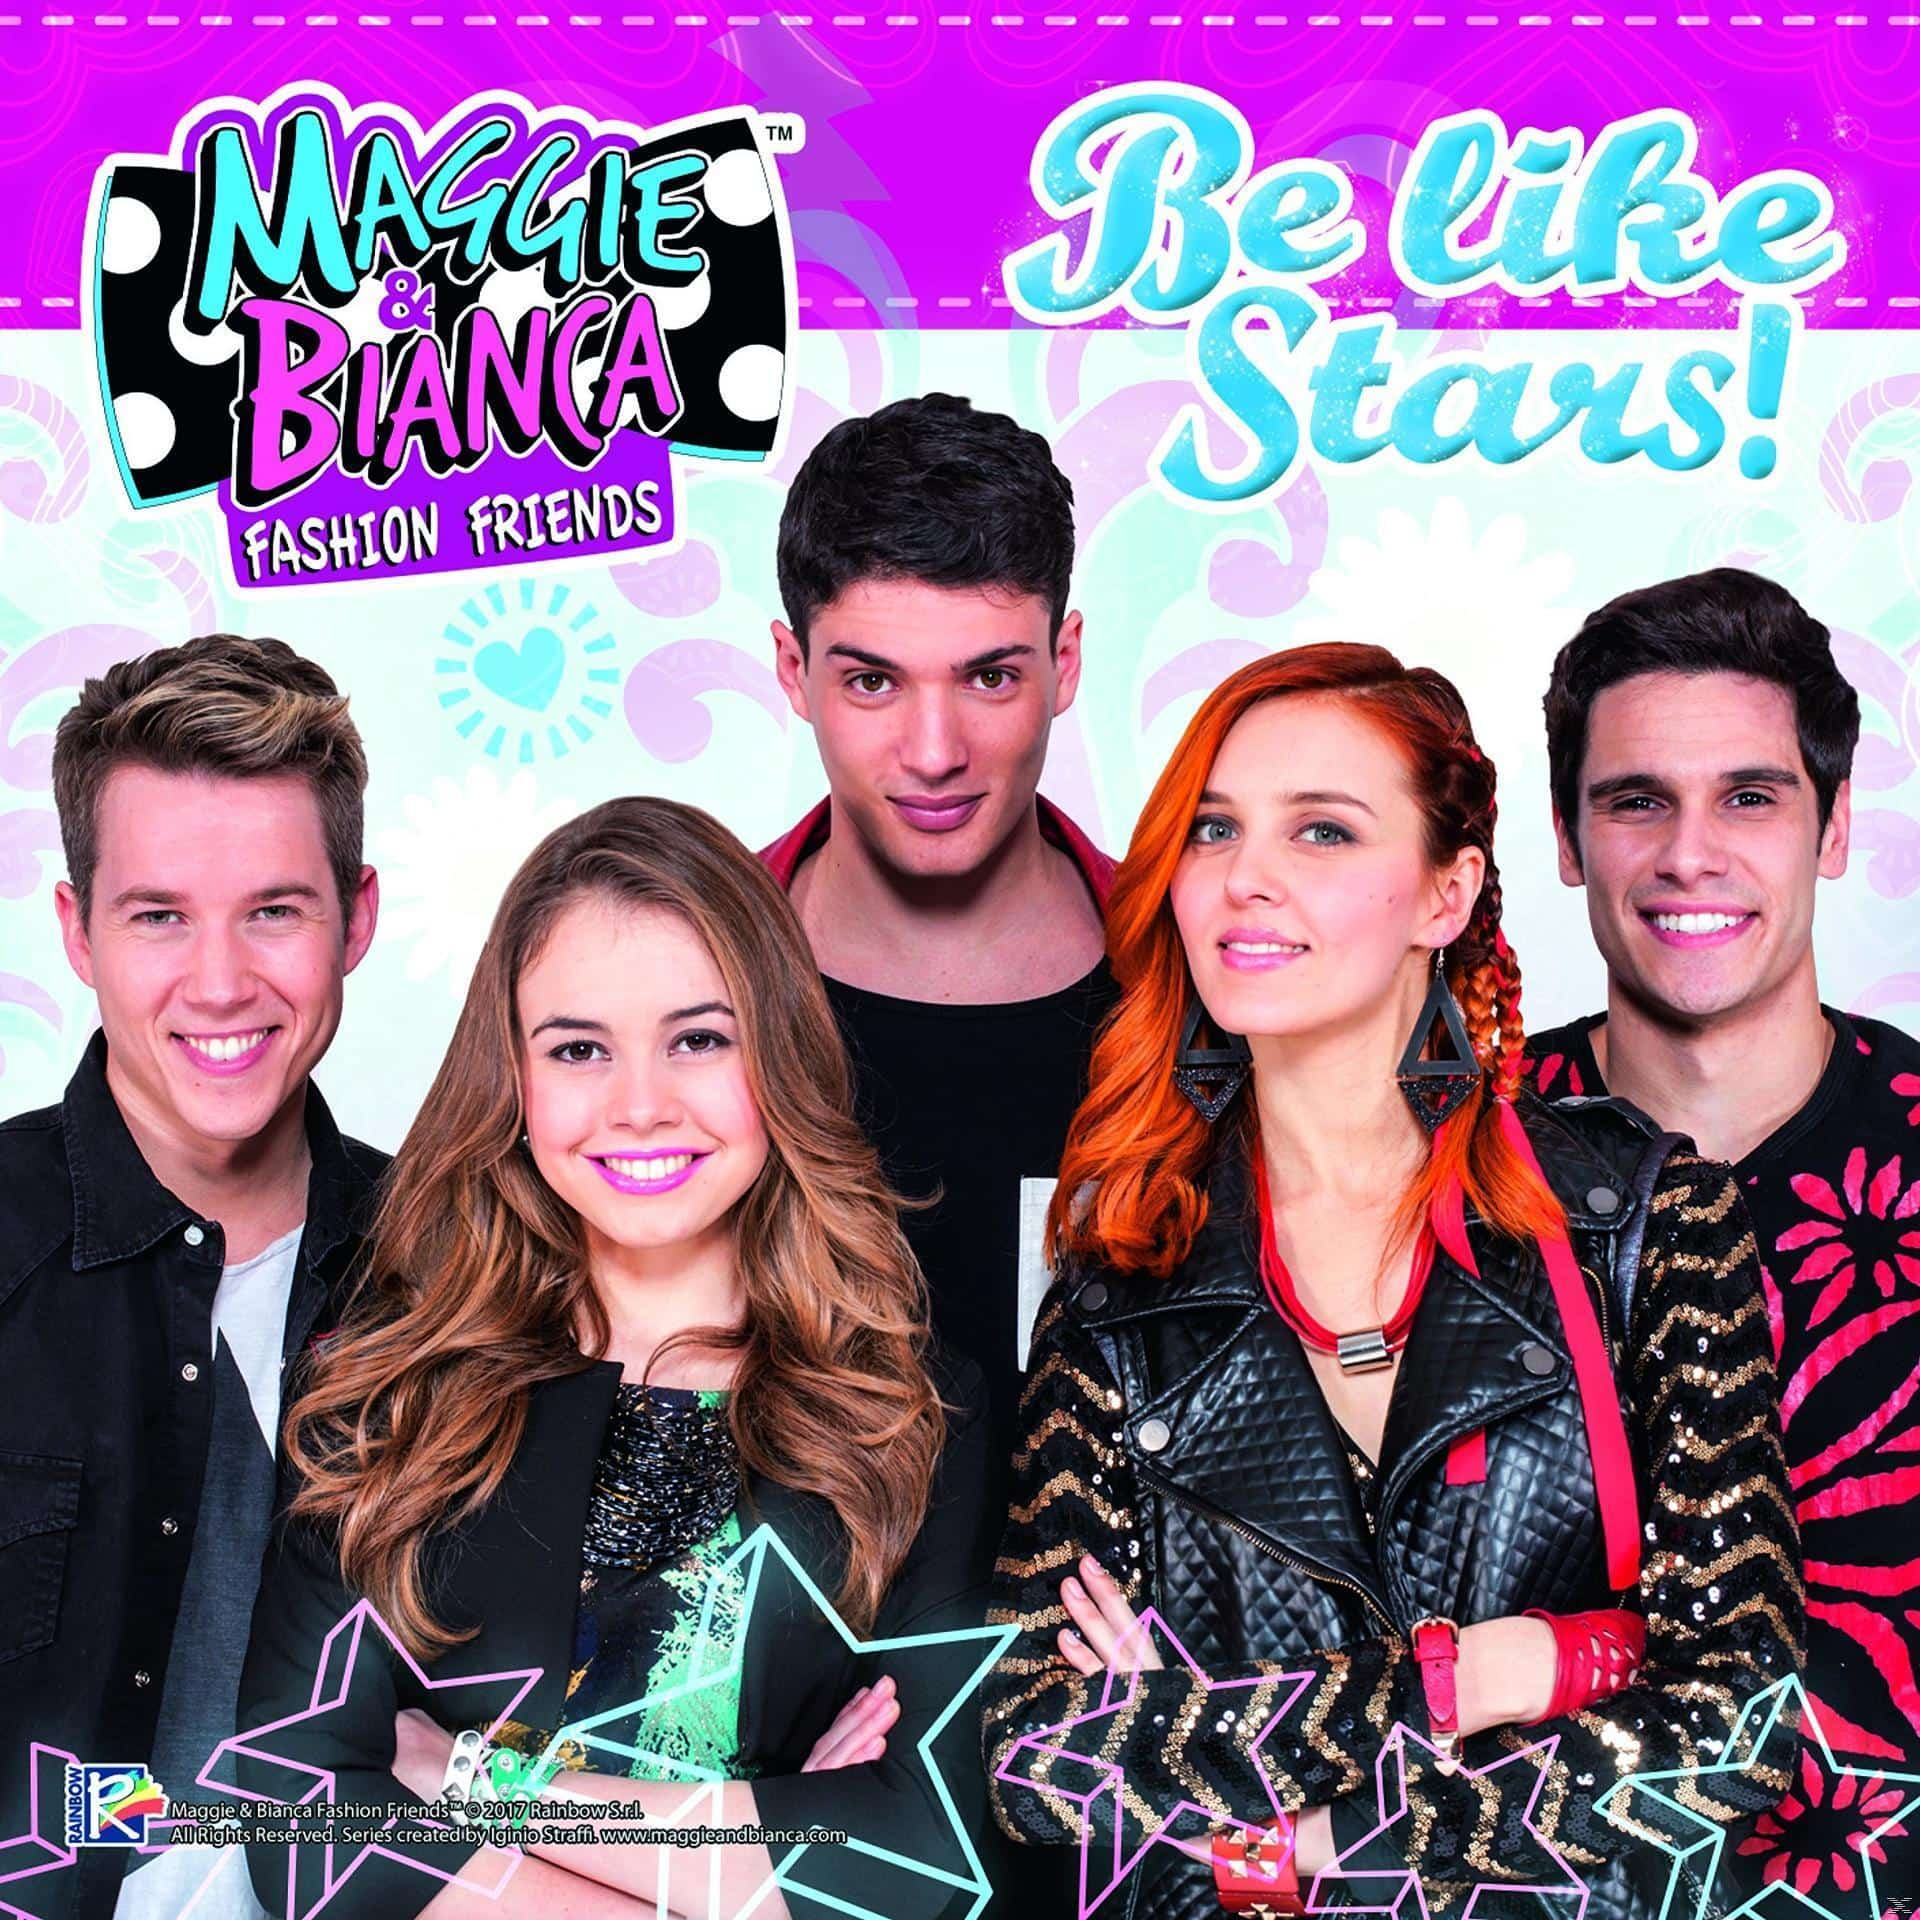 Be Like Stars! (Maggie & Bianca Fashion Friends) für 16,49 Euro